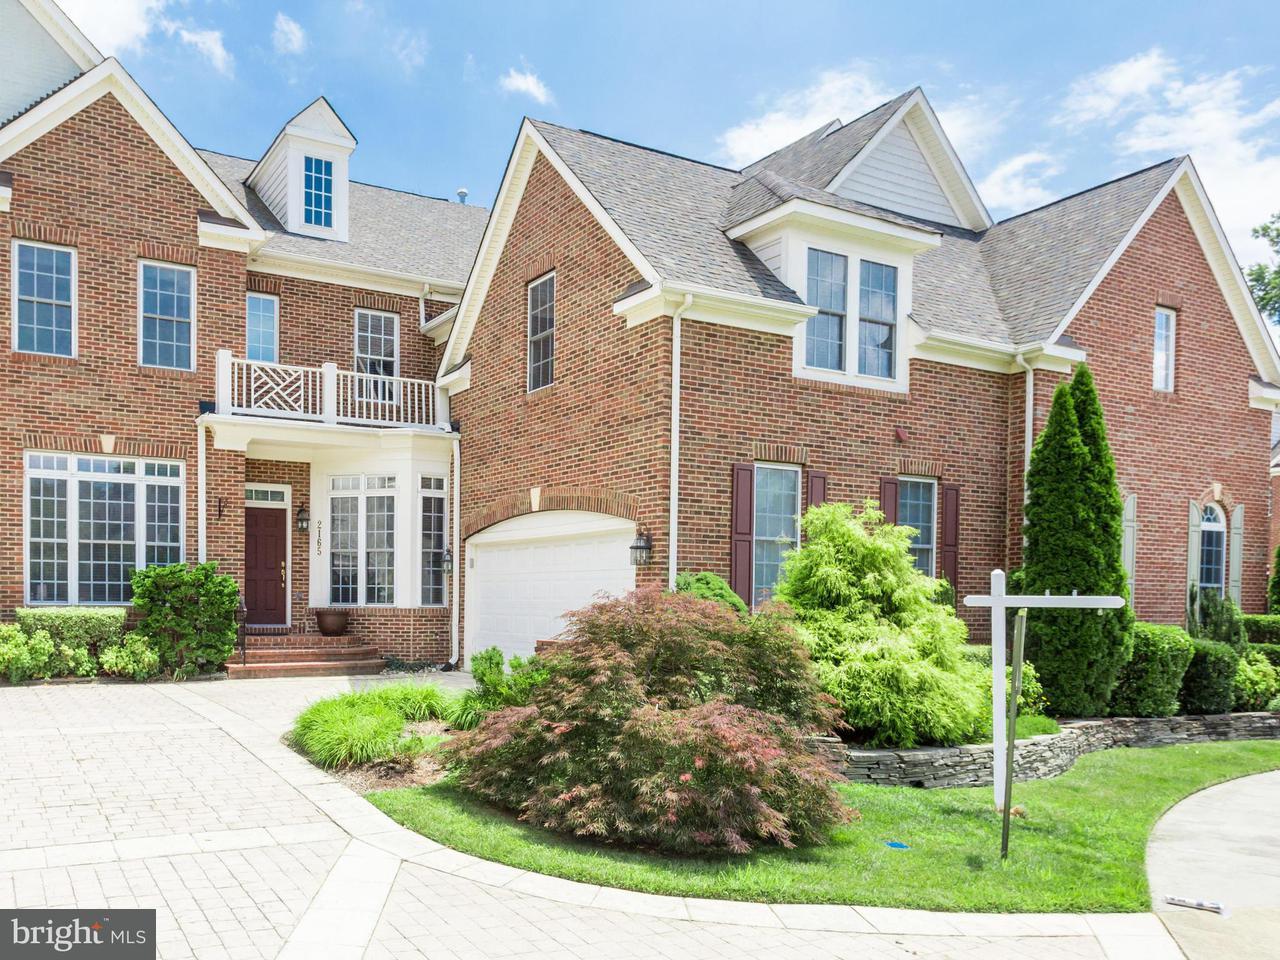 Casa unifamiliar adosada (Townhouse) por un Venta en 2165 HARITHY Drive 2165 HARITHY Drive Dunn Loring, Virginia 22027 Estados Unidos